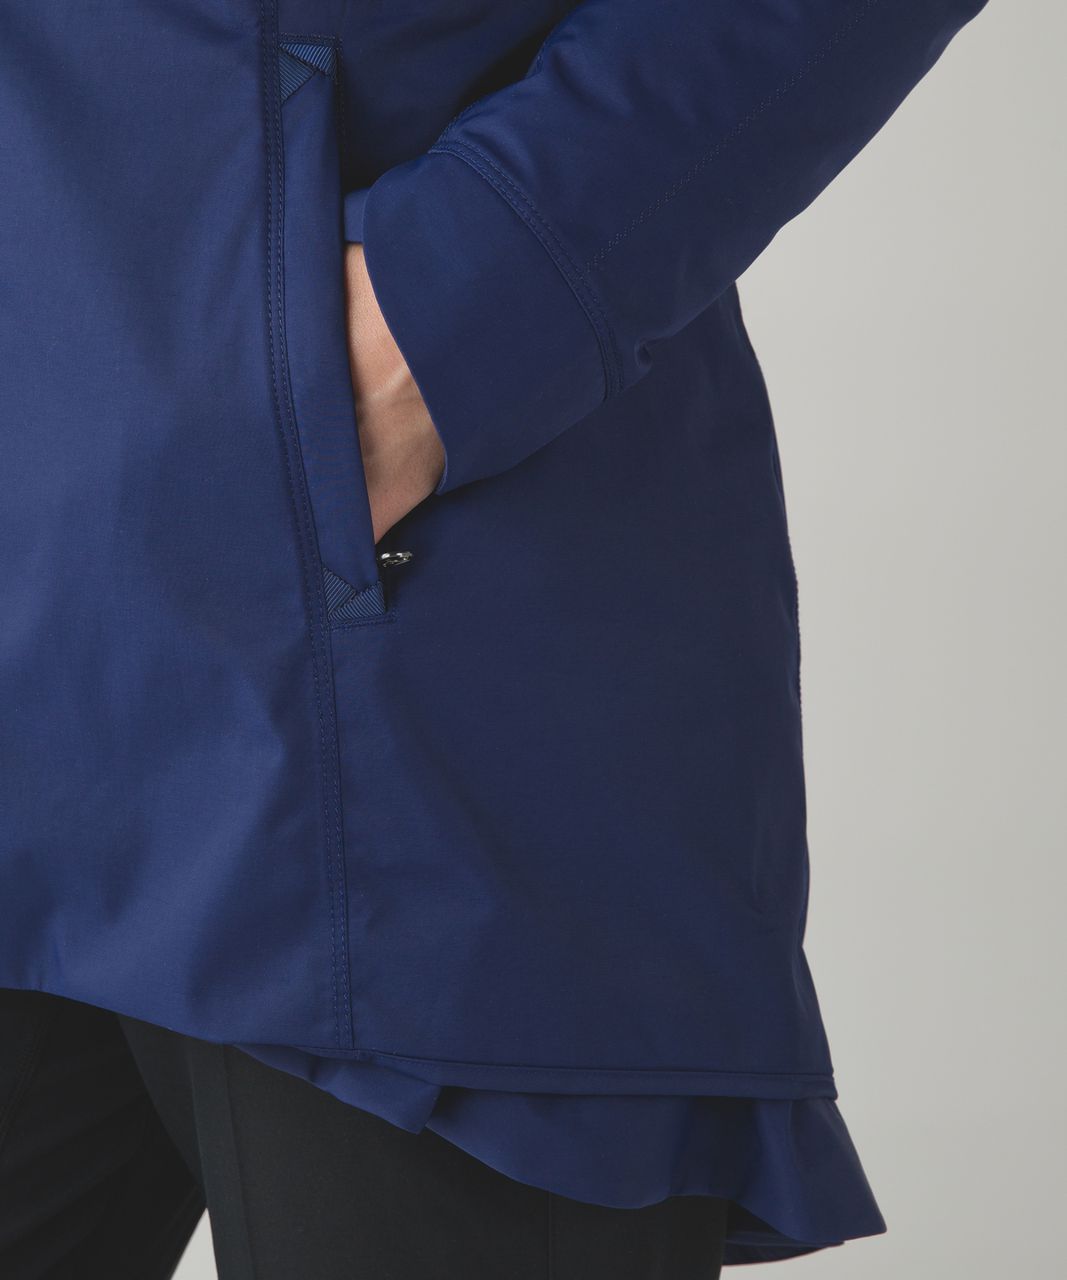 Lululemon Four The Helluvit Jacket - Hero Blue